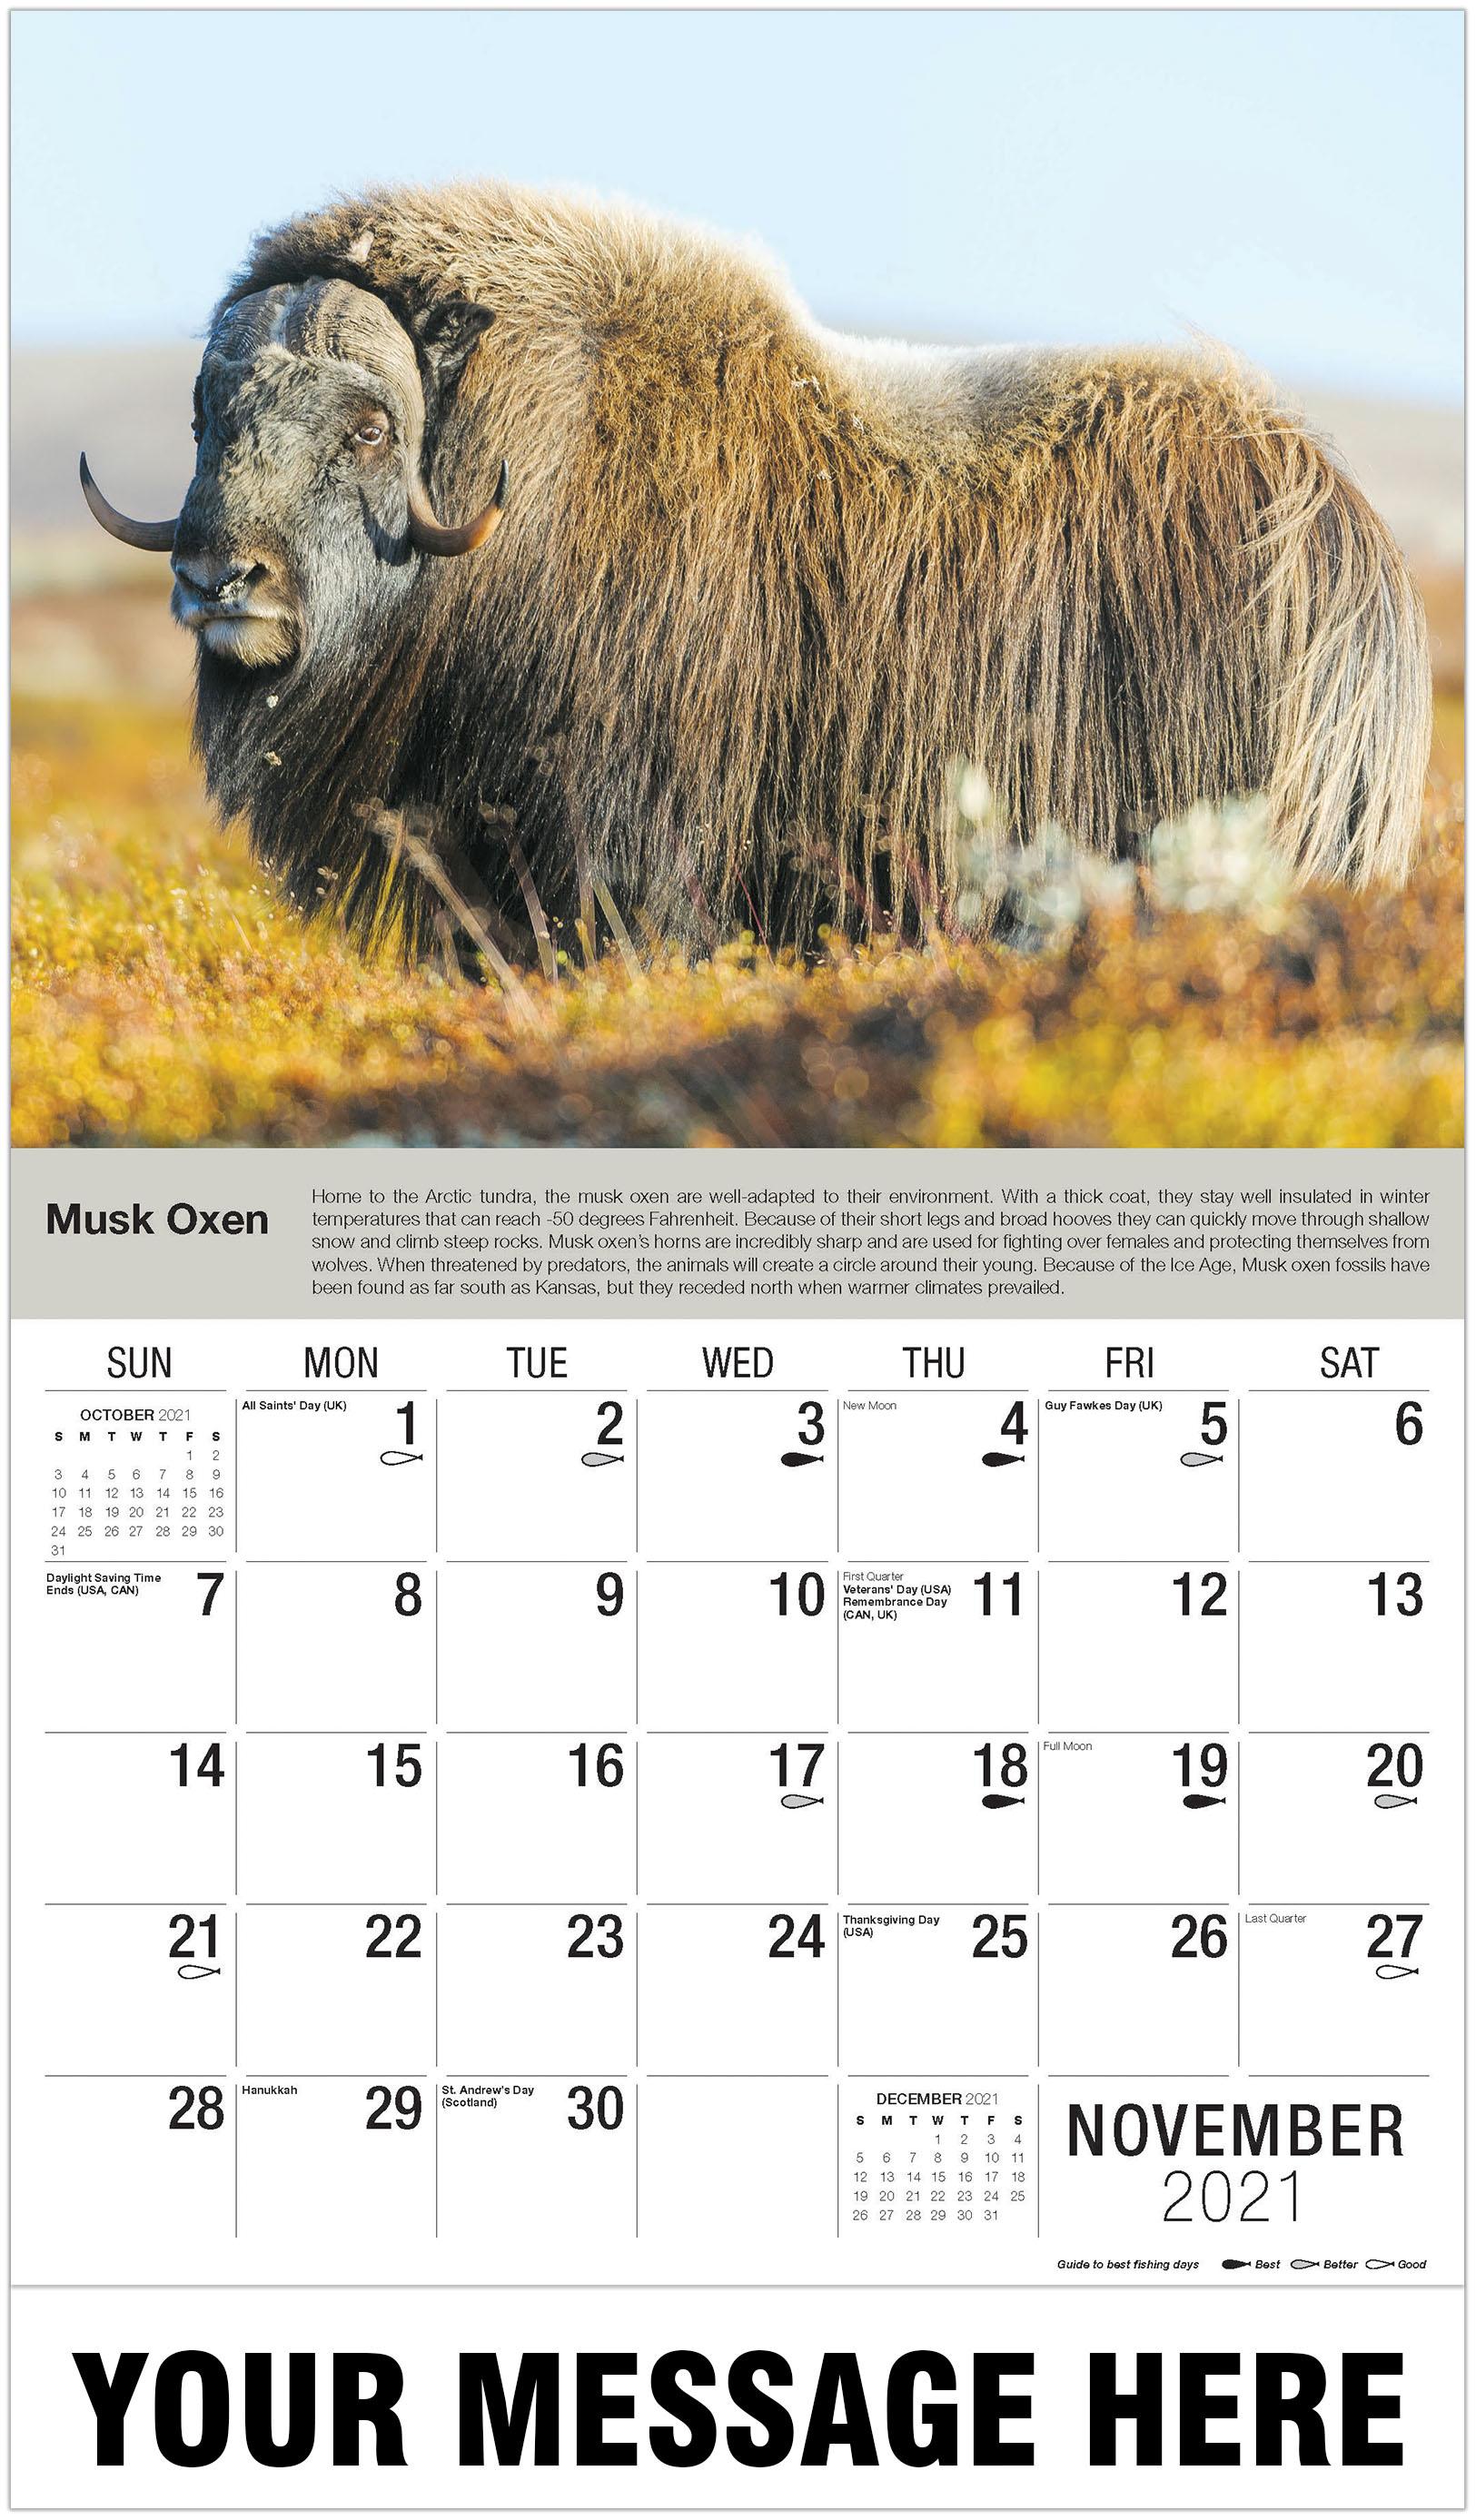 Musk Ox - November - North American Wildlife 2021 Promotional Calendar